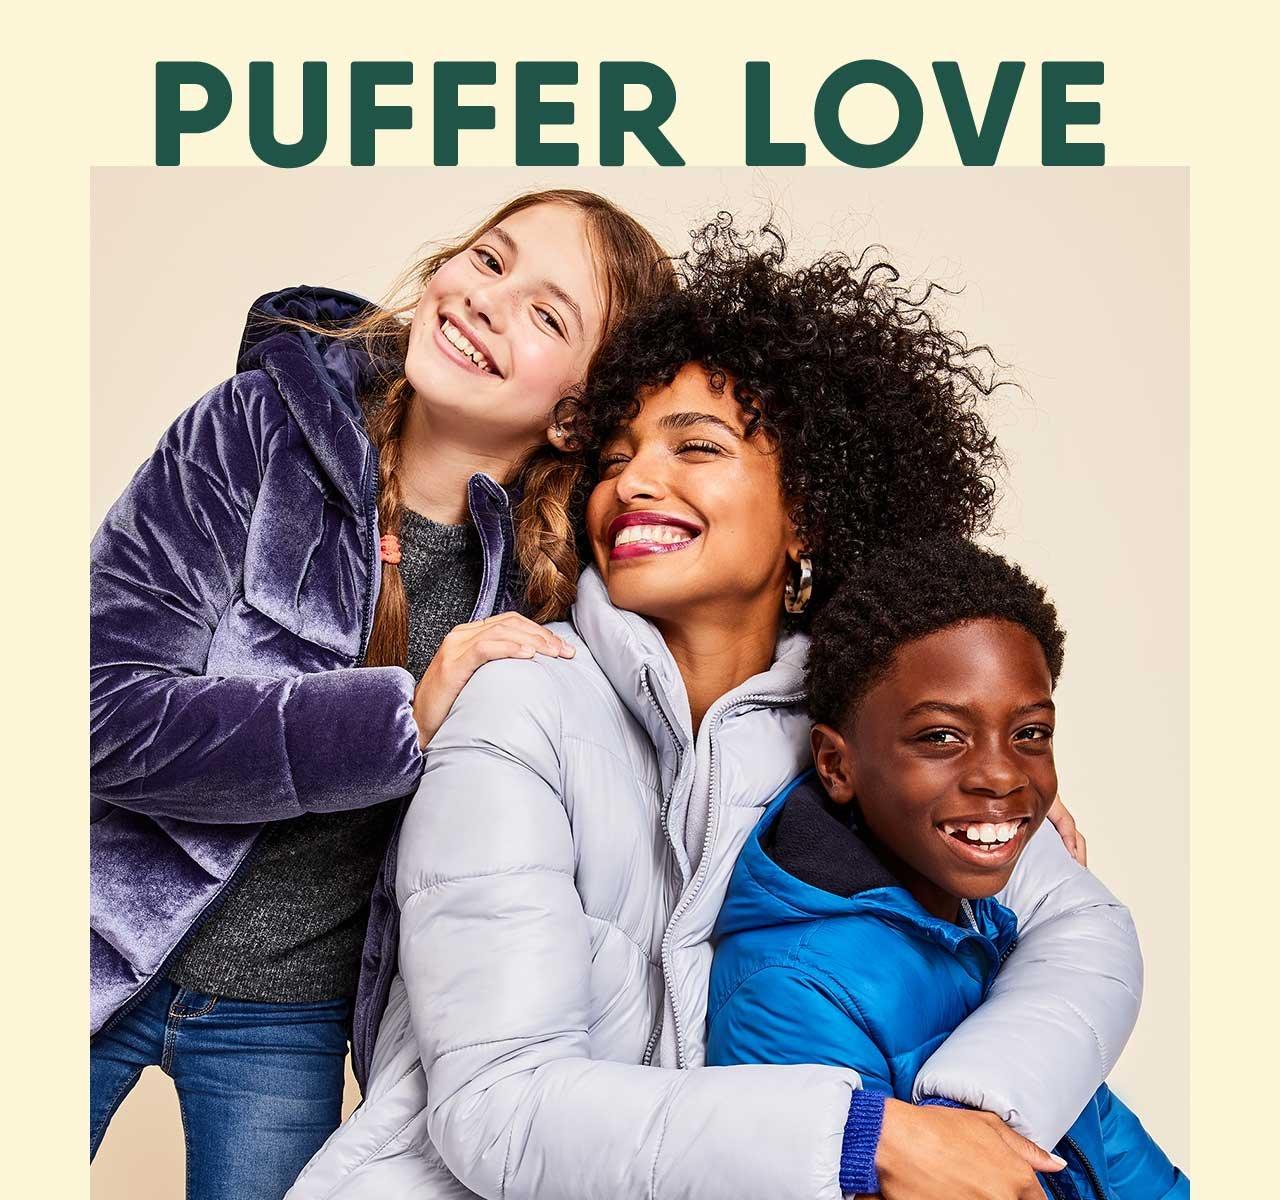 Puffer love